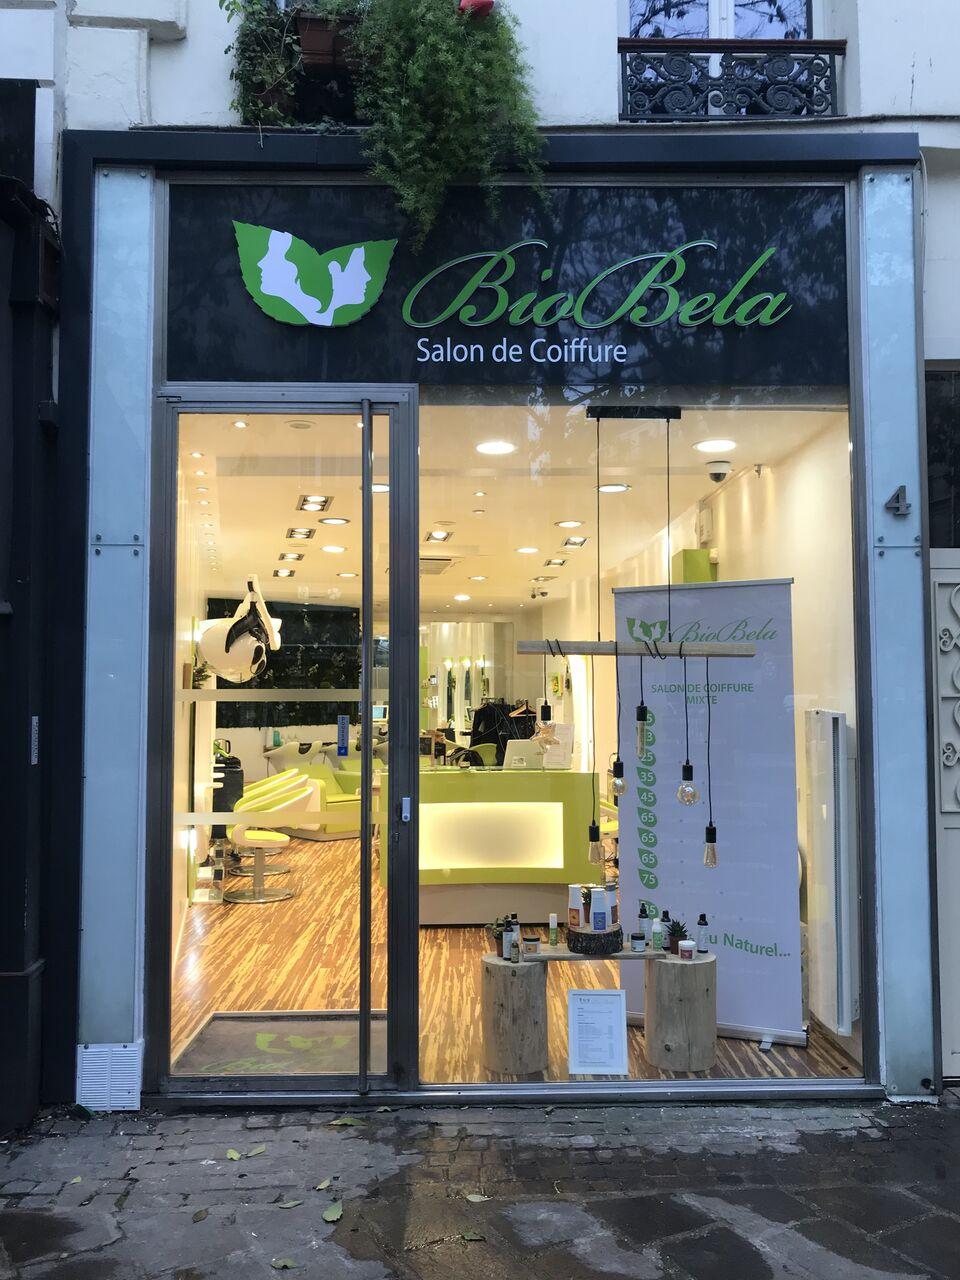 Les salons biobela biobela for Salon de the chatelet